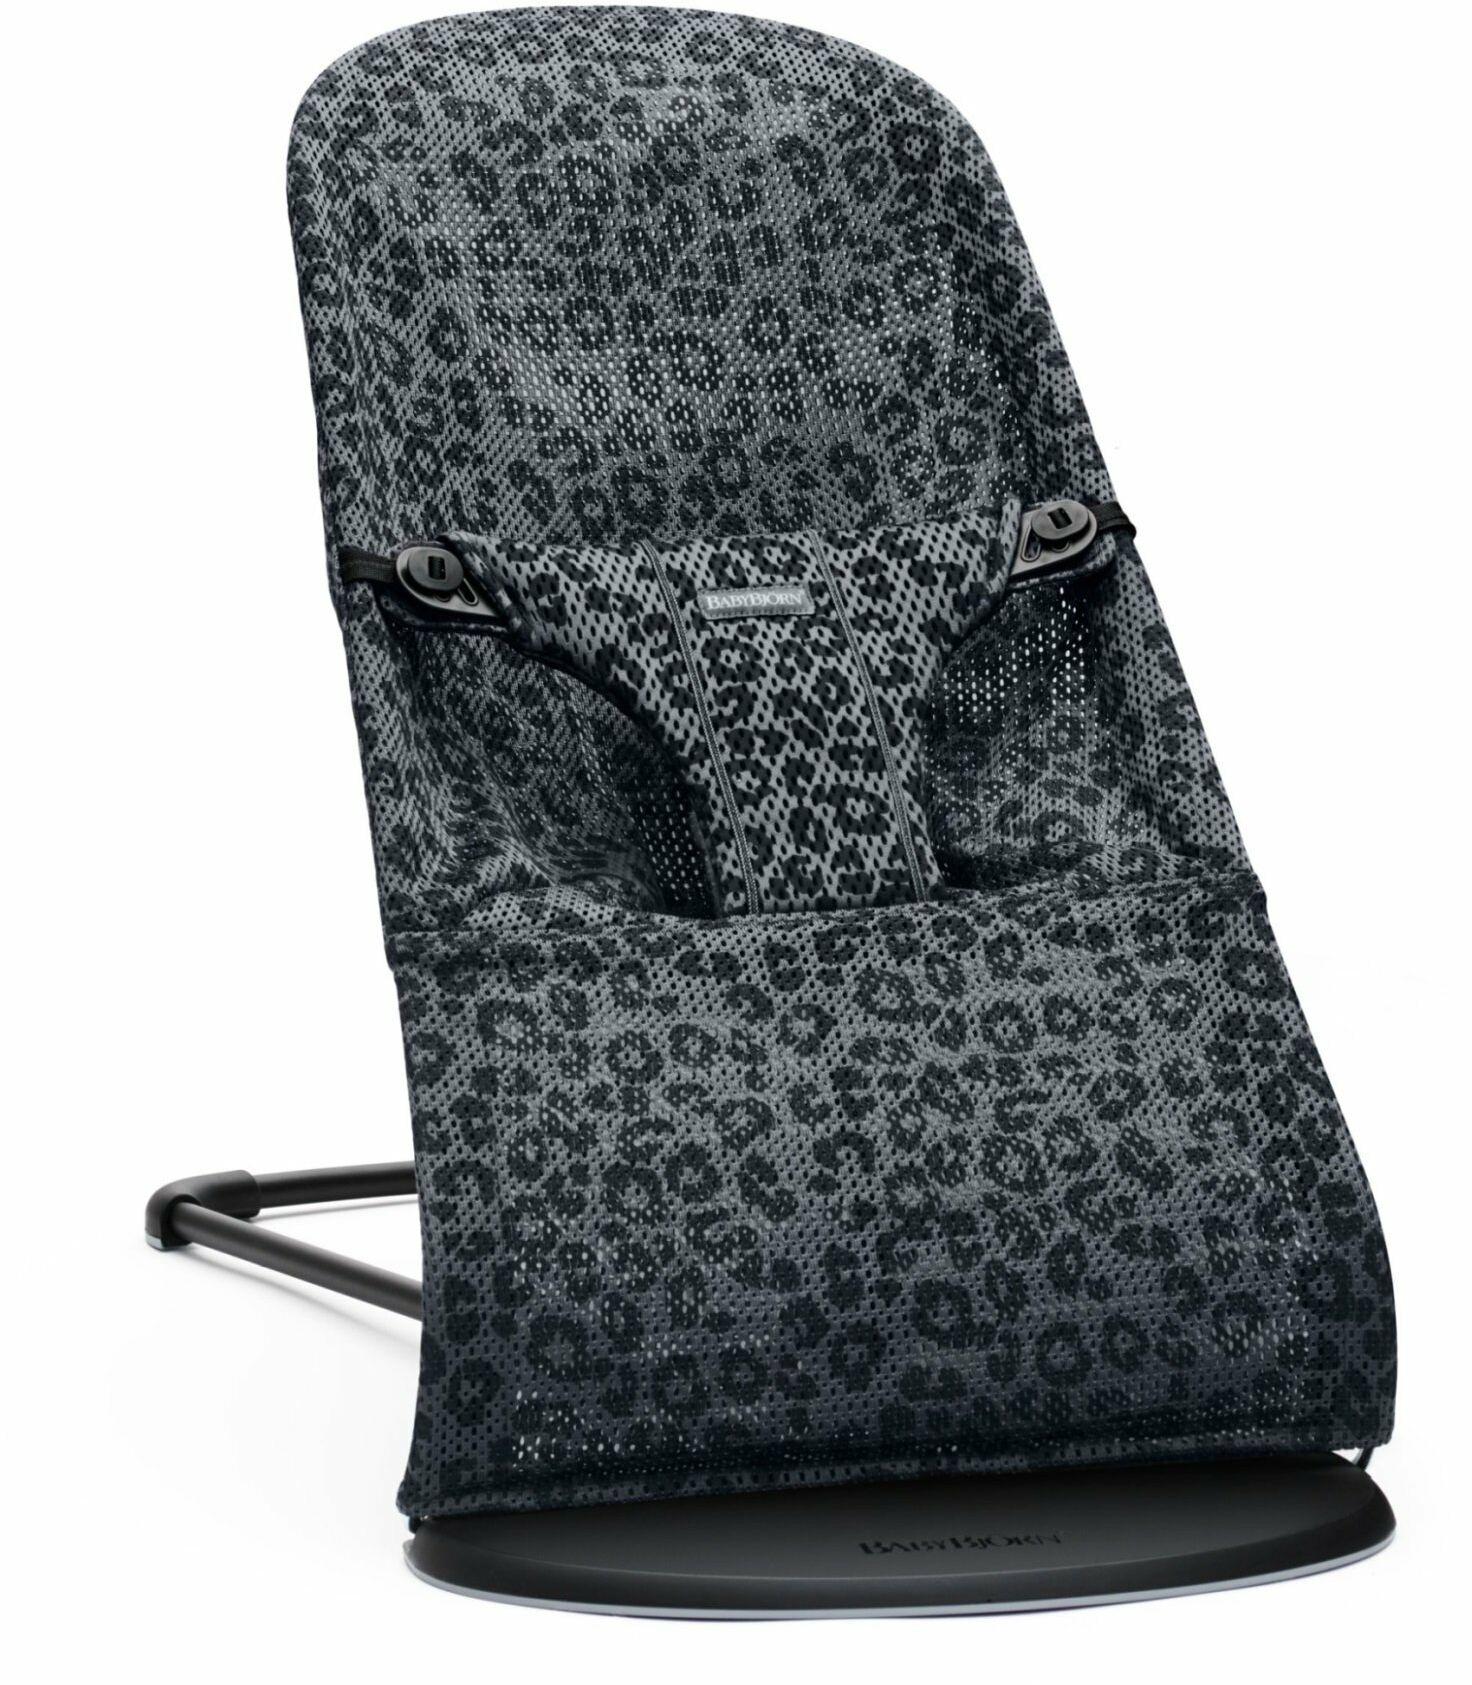 BABYBJORN - leżaczek BLISS MESH - Antracytowy/Leopard